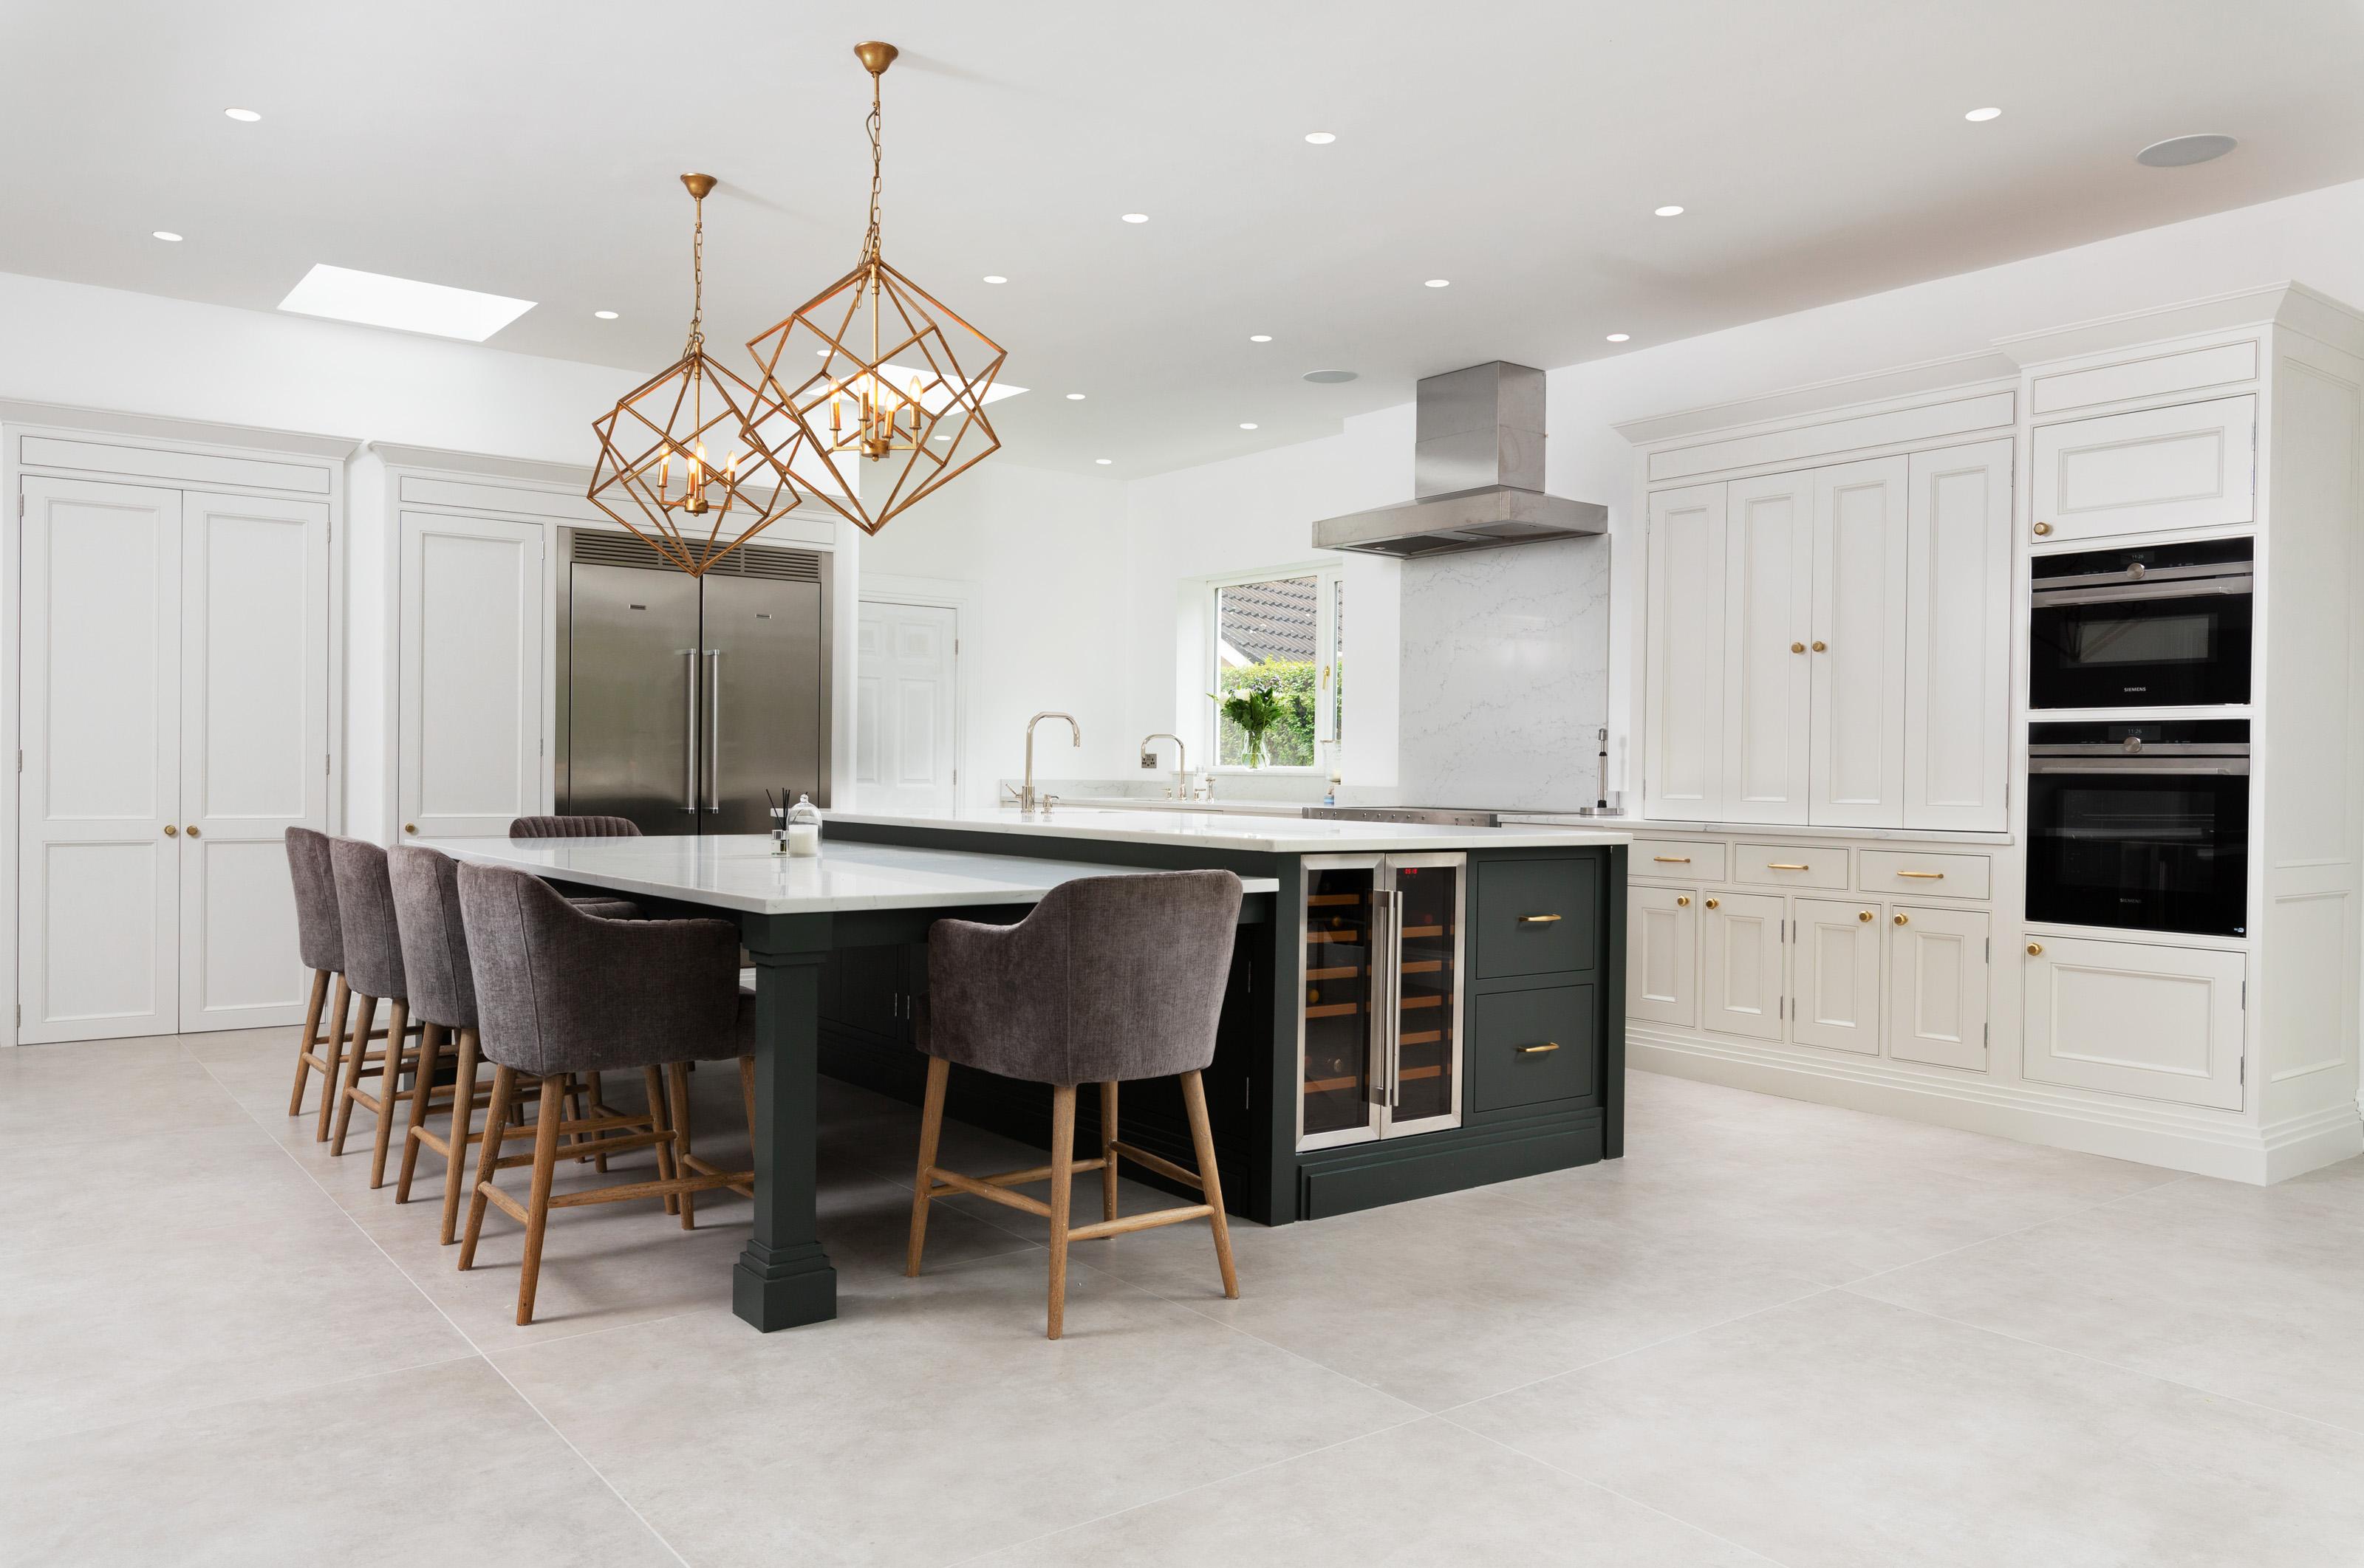 Watsons_Kitchens_Harrogate-6-1